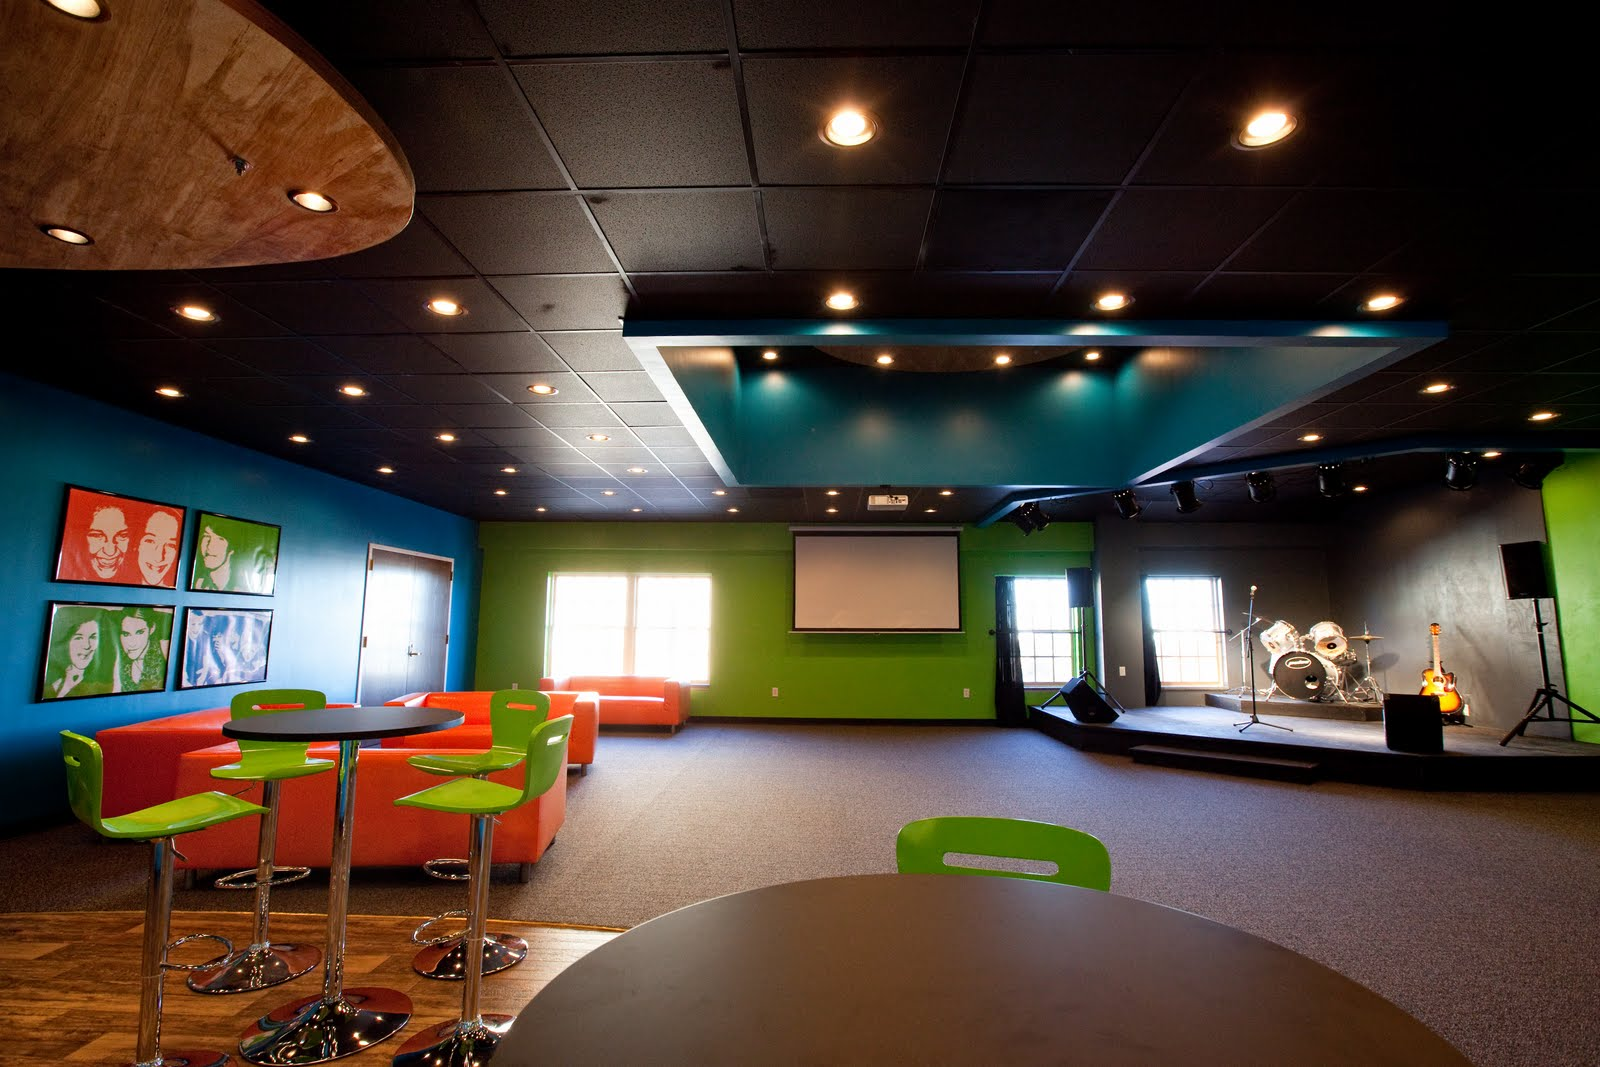 99 Youth Room Decor Ideas